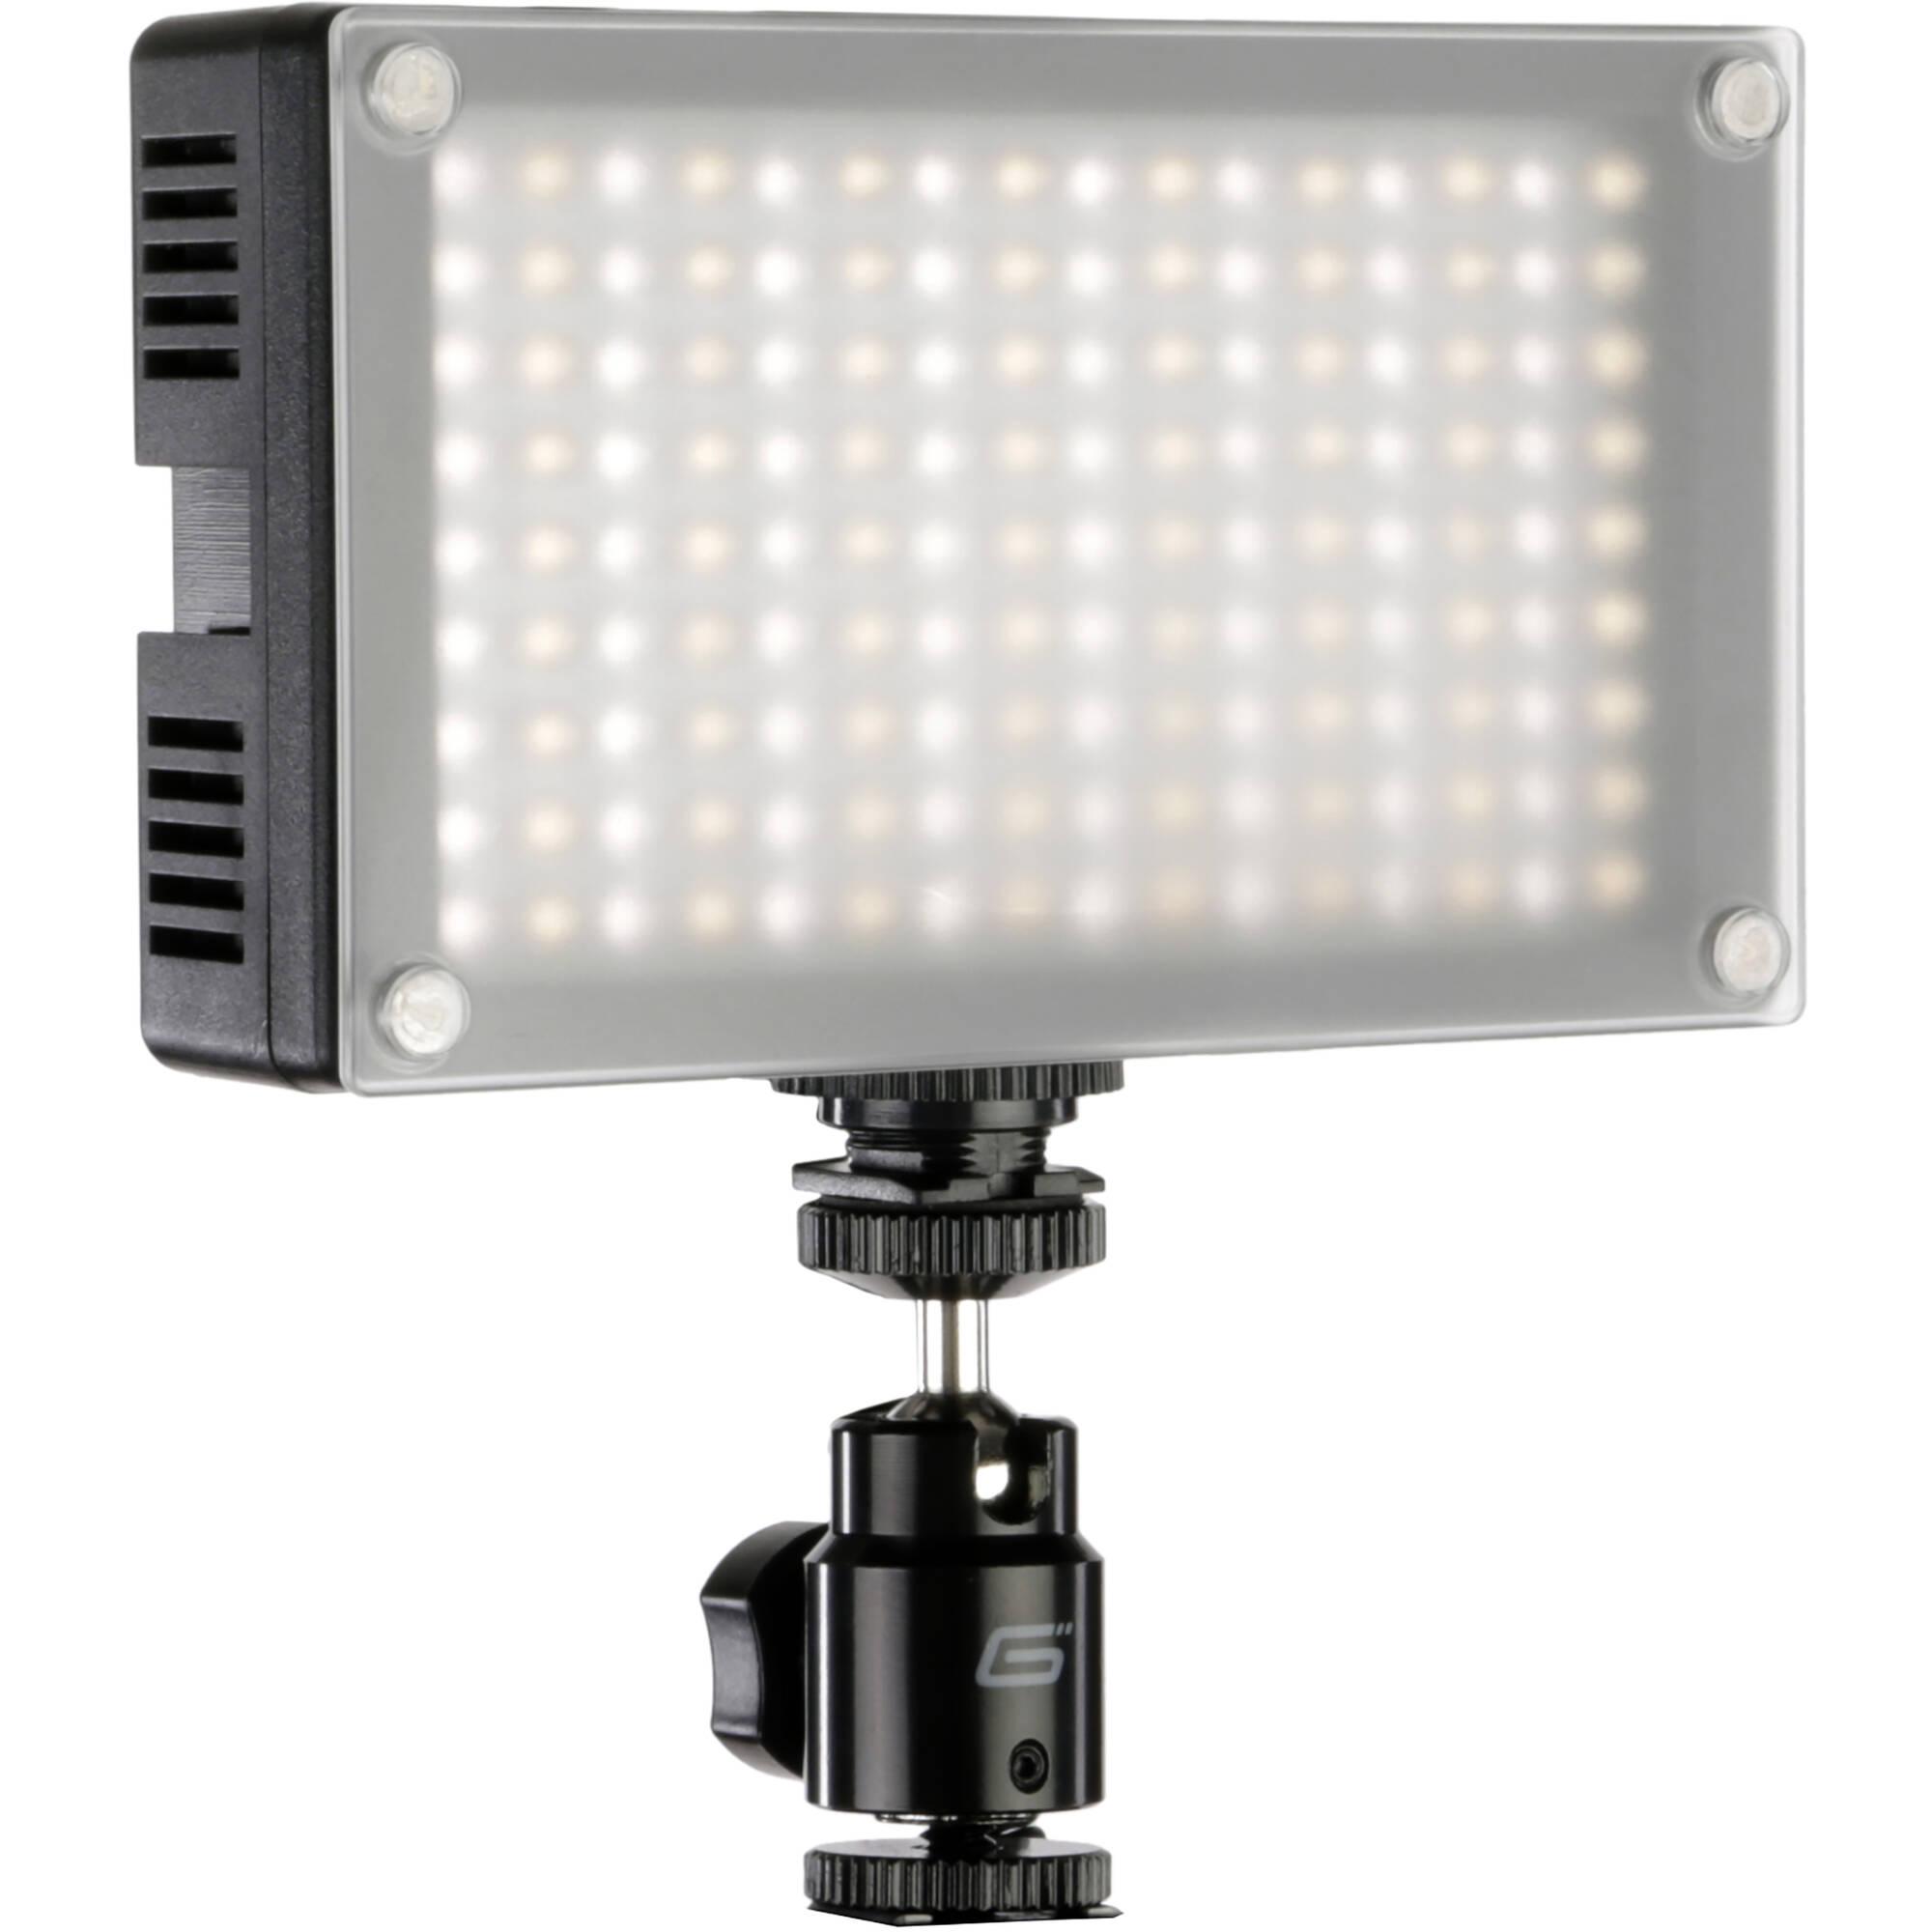 Genaray LED-6200T 144 LED Variable-Color On-Camera LED ...